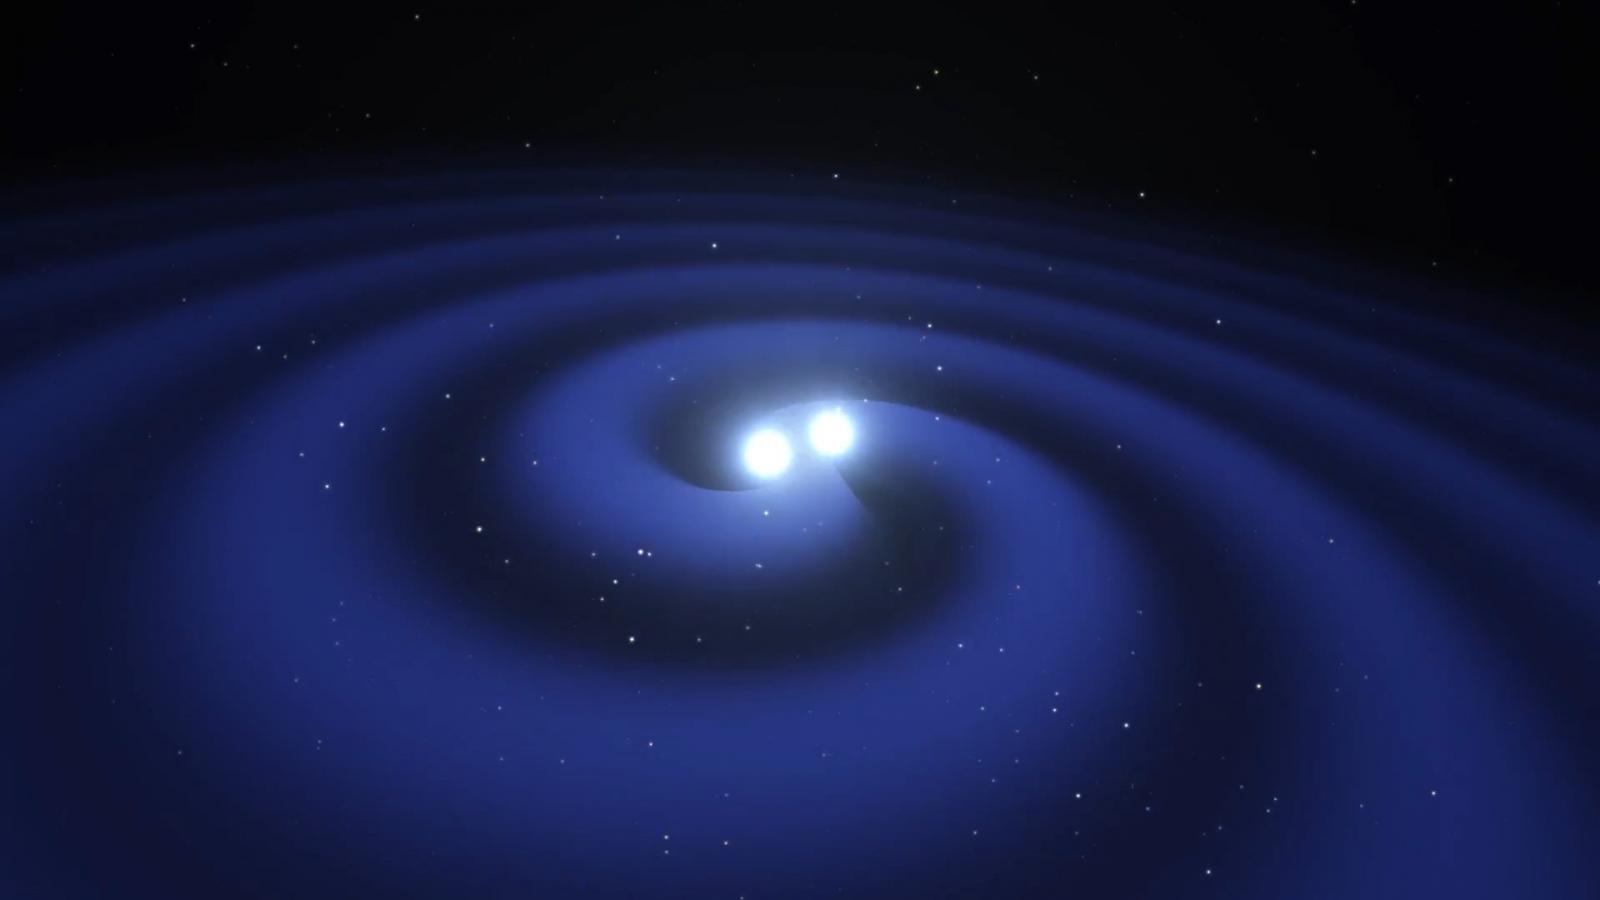 kilonova-first-ever-light-from-gravitational-wave-source-detected